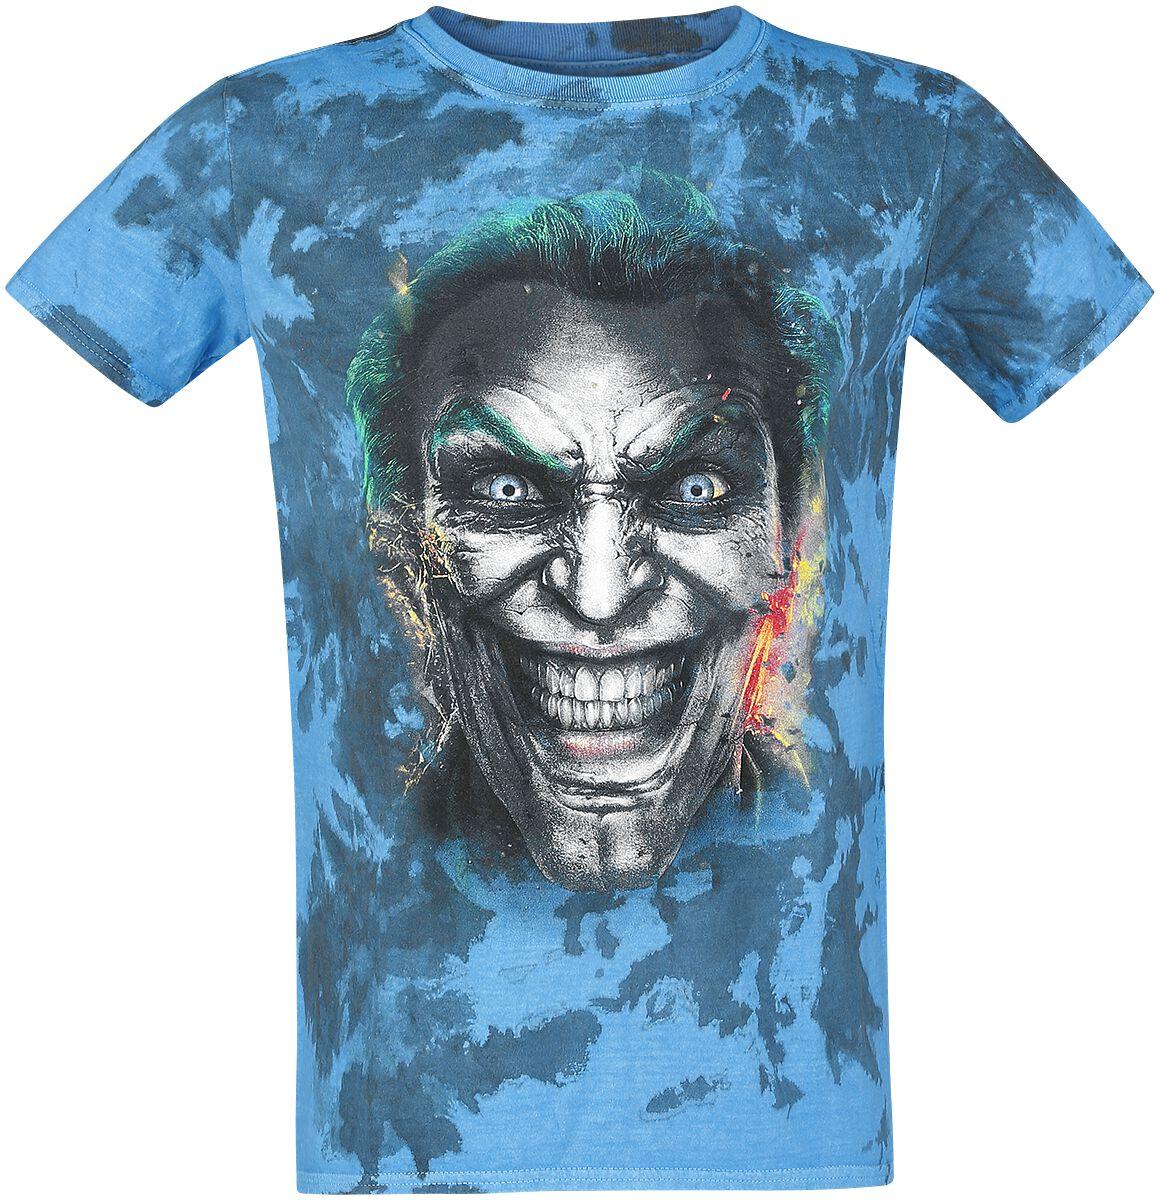 Merch dla Fanów - Koszulki - T-Shirt The Joker Fratze T-Shirt wielokolorowy - 361341